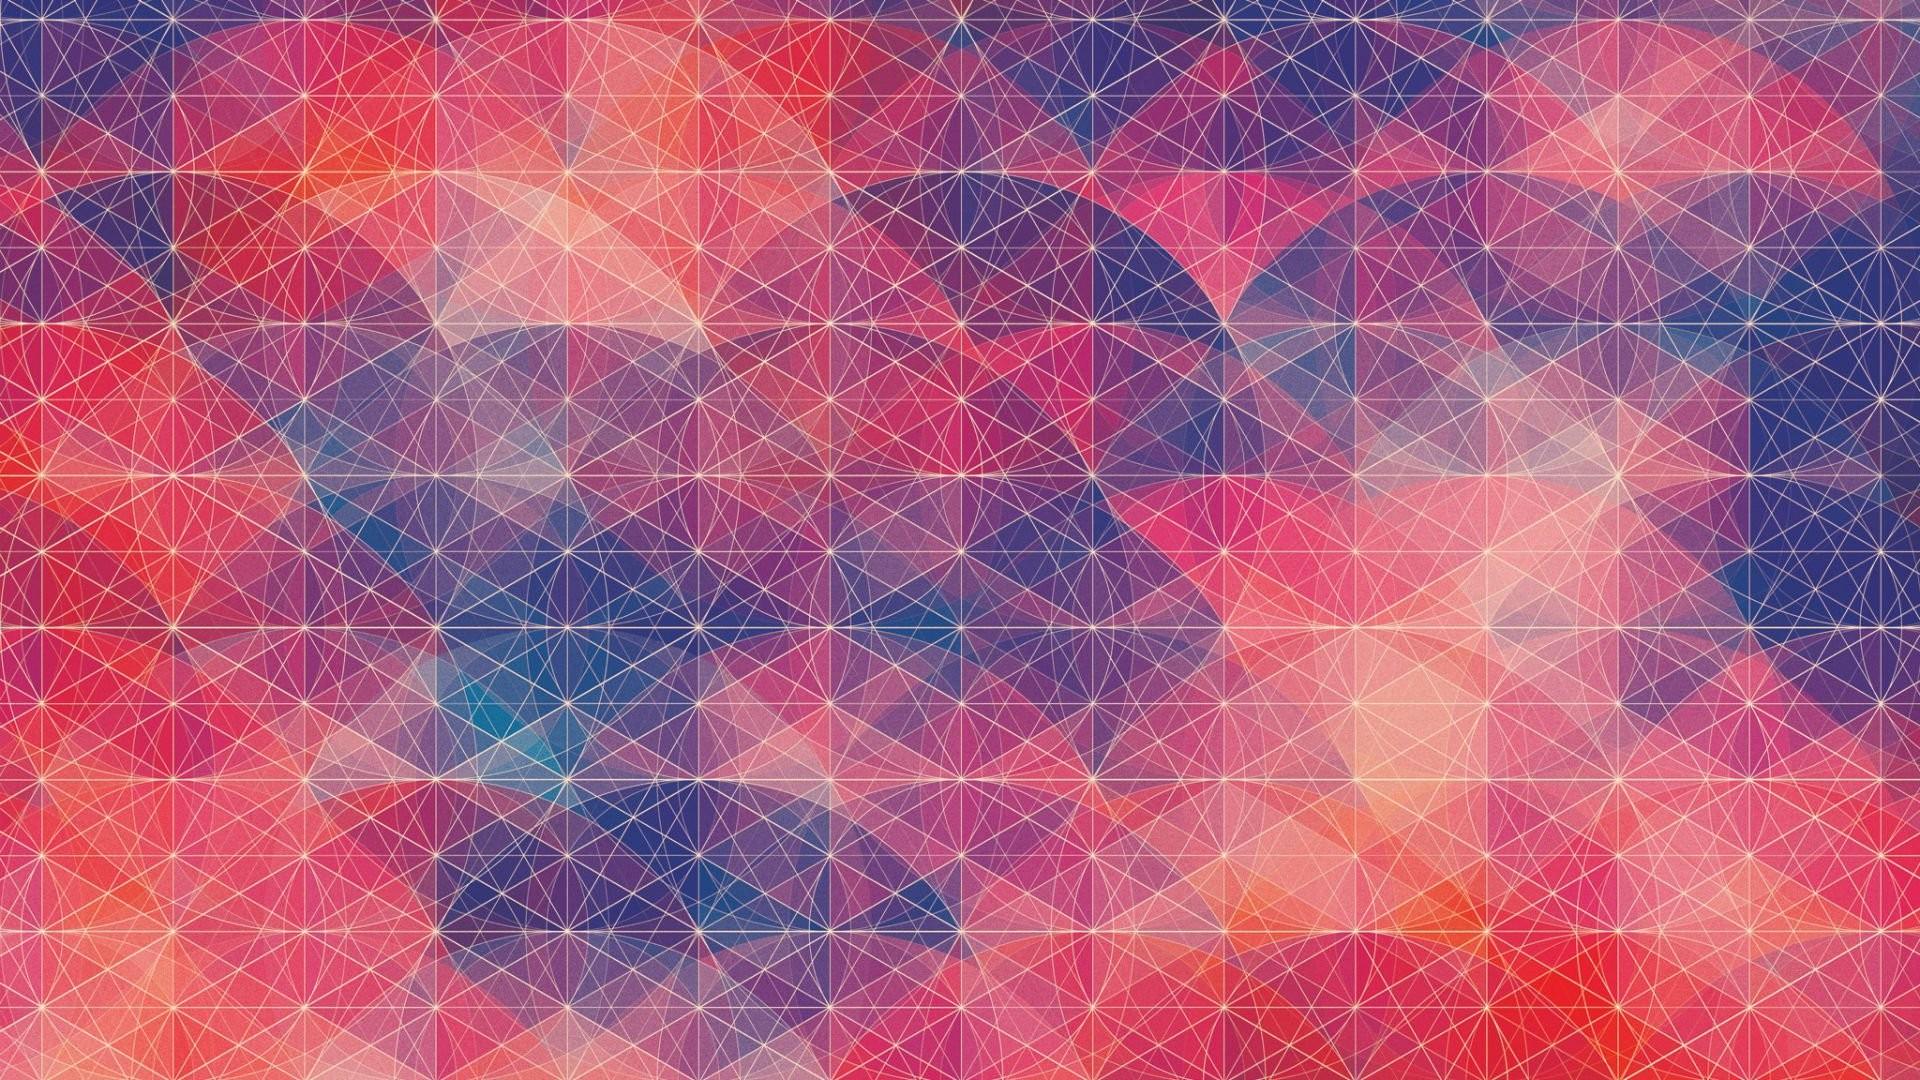 Popular Wallpaper Macbook Geometric - 287482-geometric-background-1920x1080-for-samsung  Best Photo Reference_321034.jpg